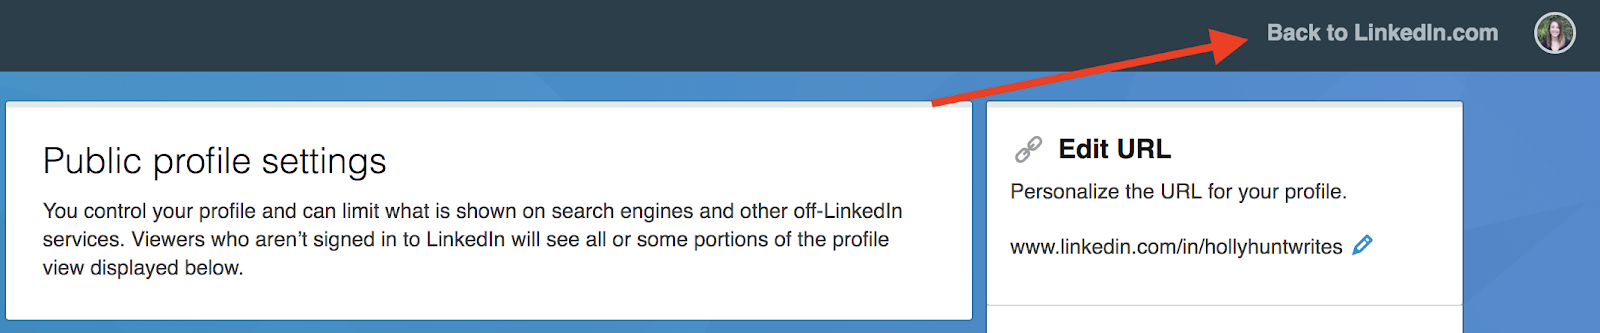 linkedin-url-change